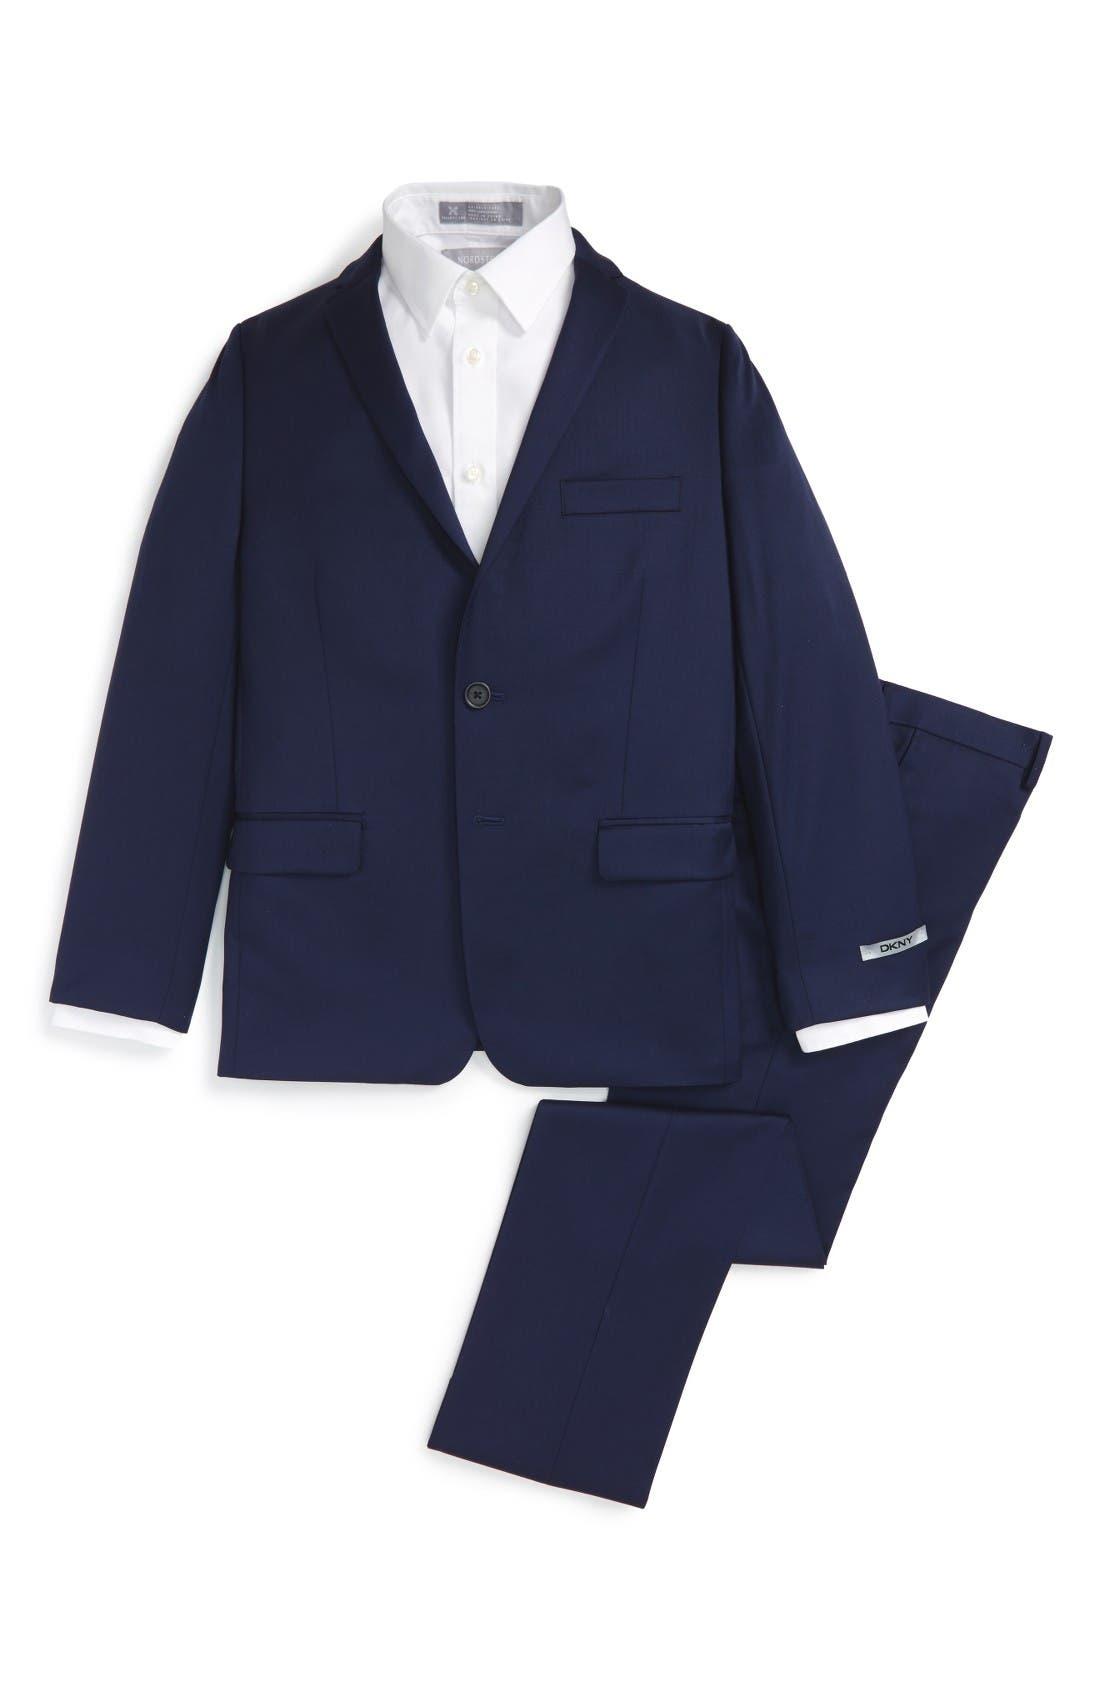 DKNY Wool Suit